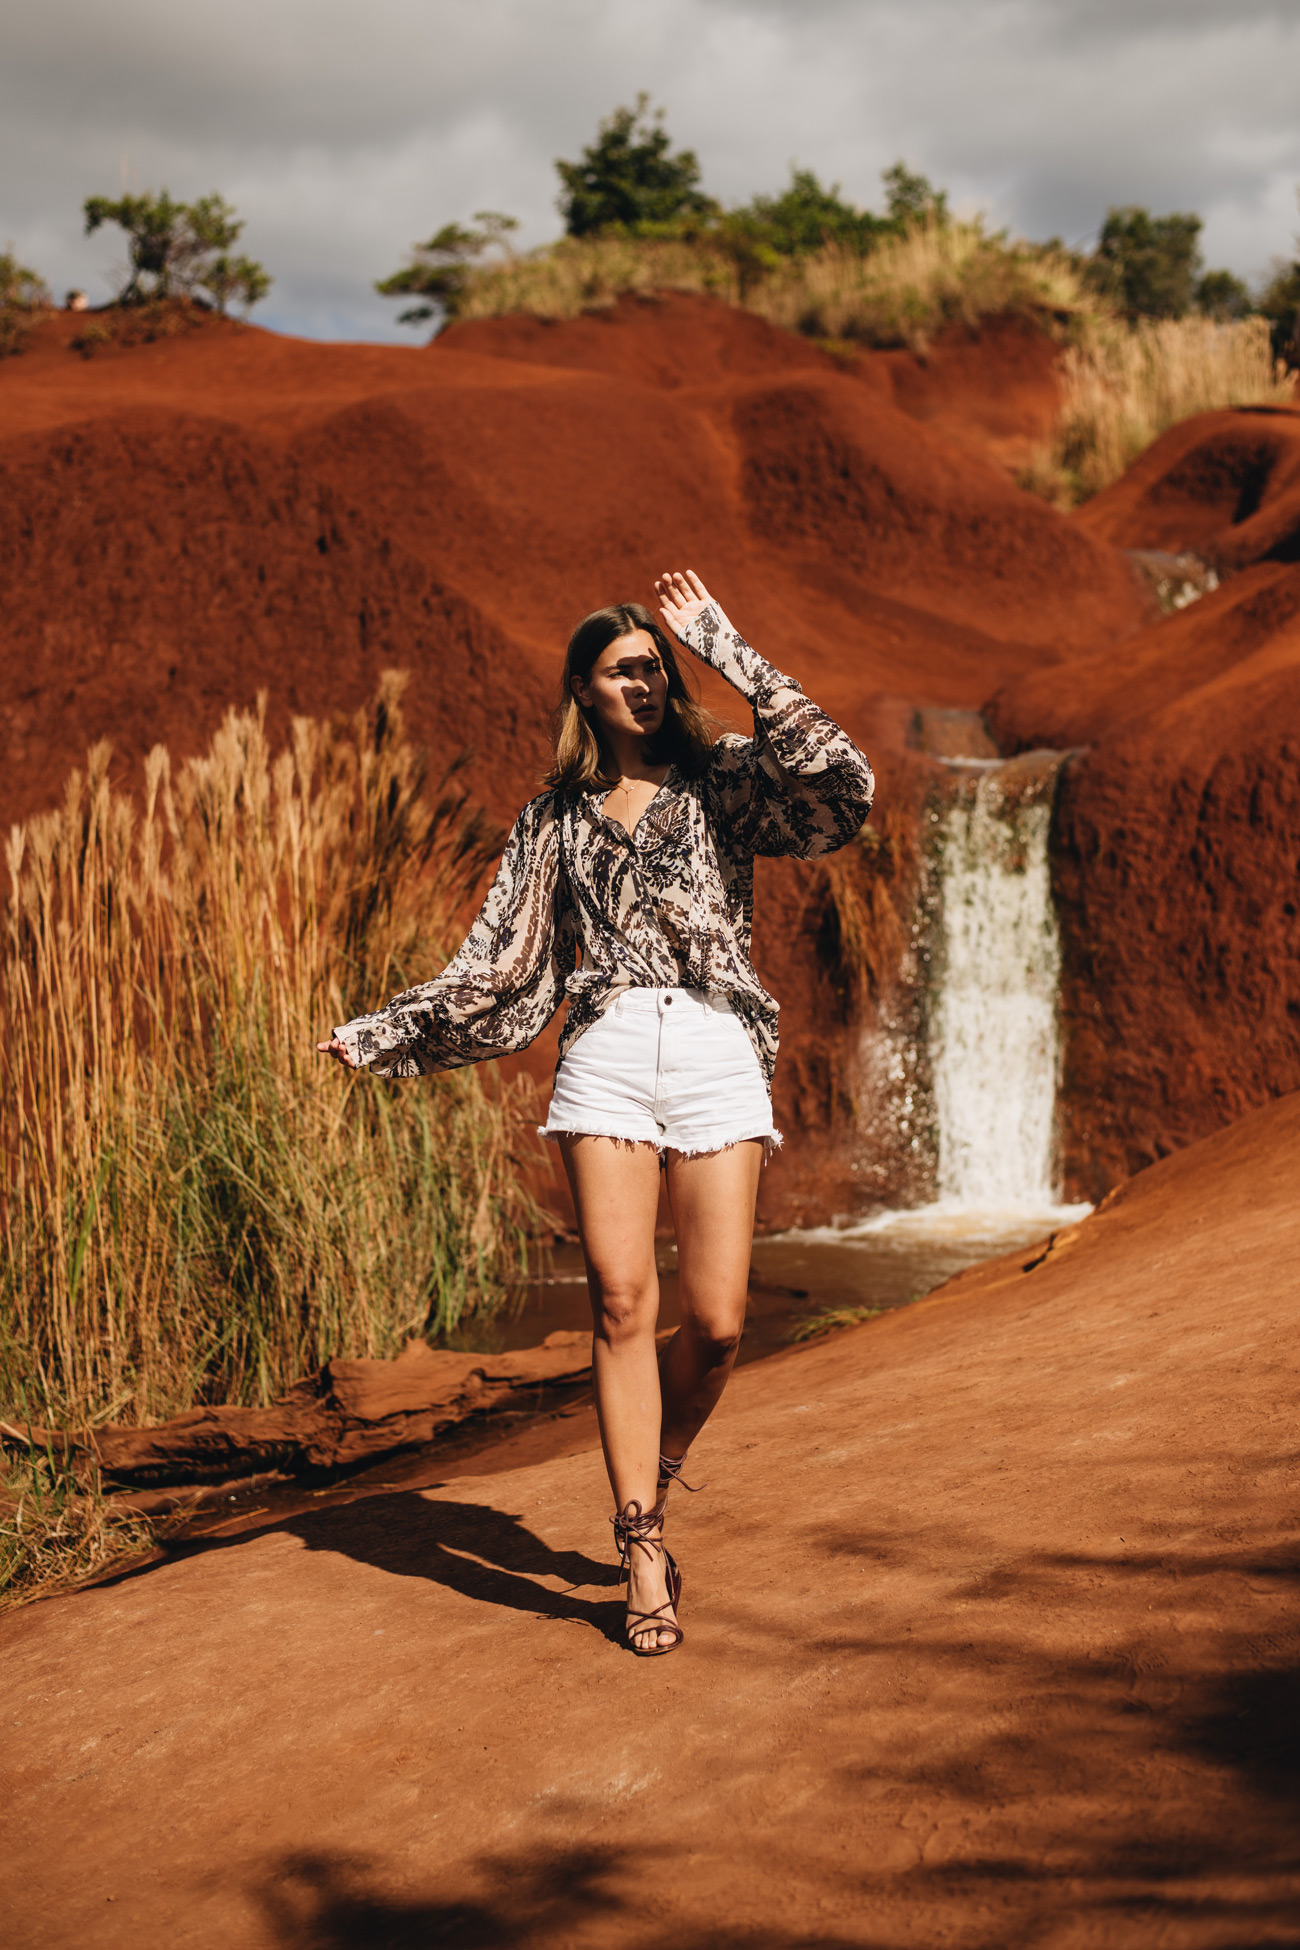 Modetrends 2020: Shorts